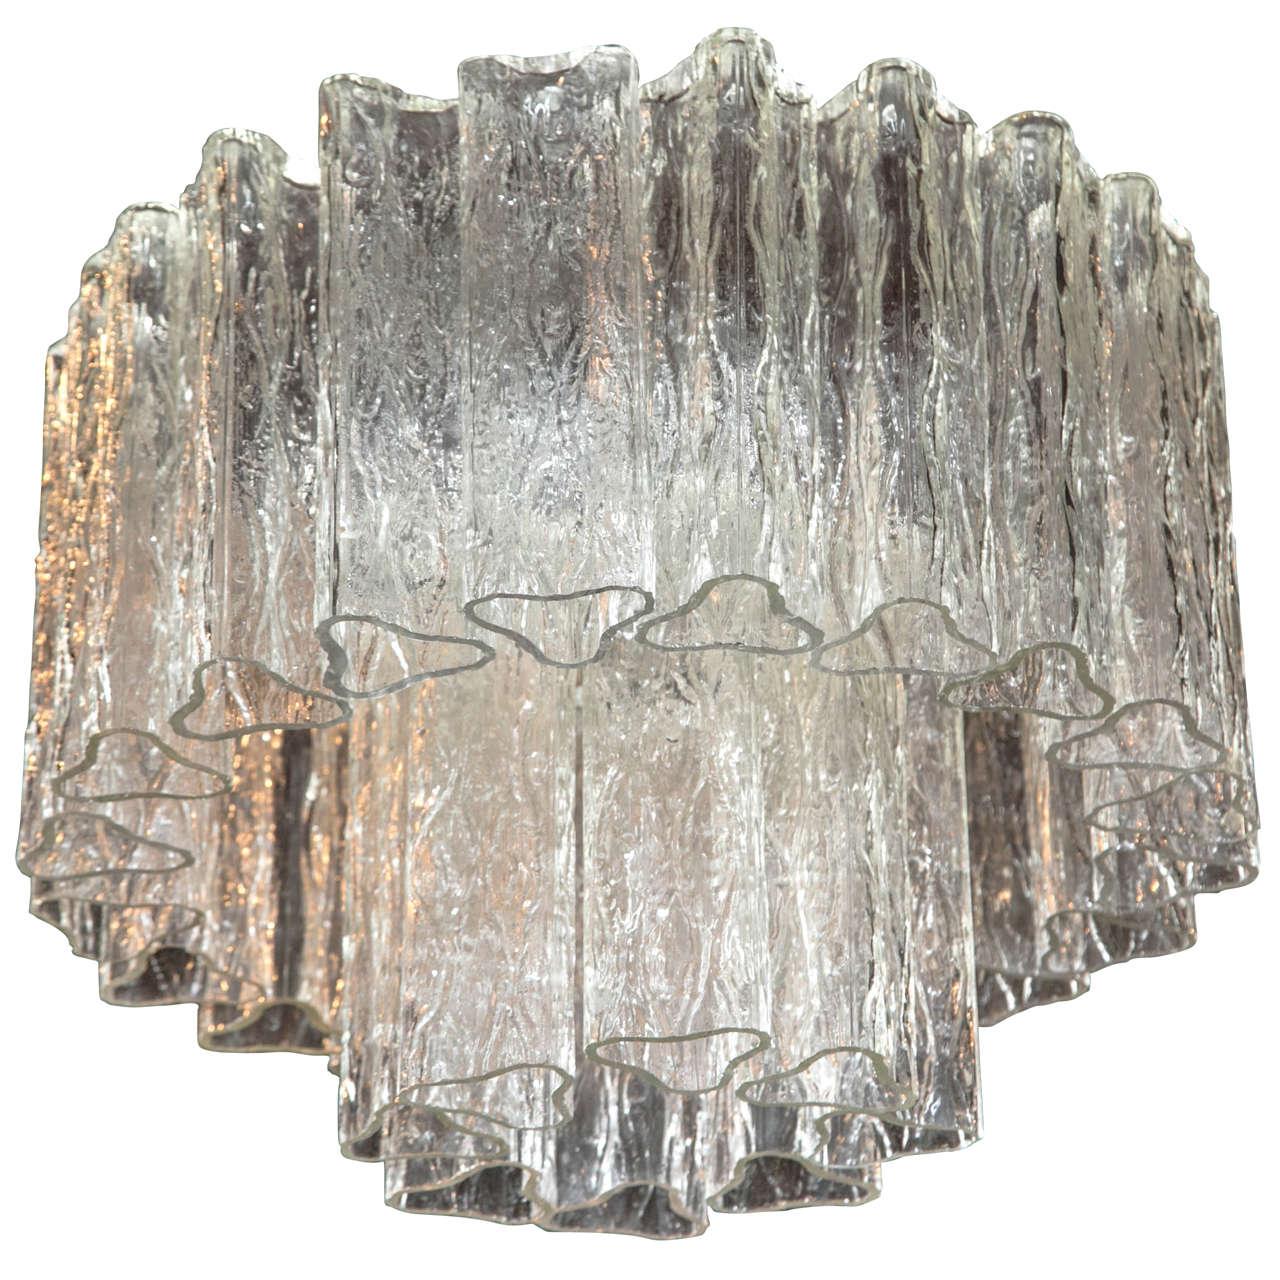 Large tronchi venini chandelier for sale at 1stdibs large tronchi venini chandelier for sale aloadofball Images